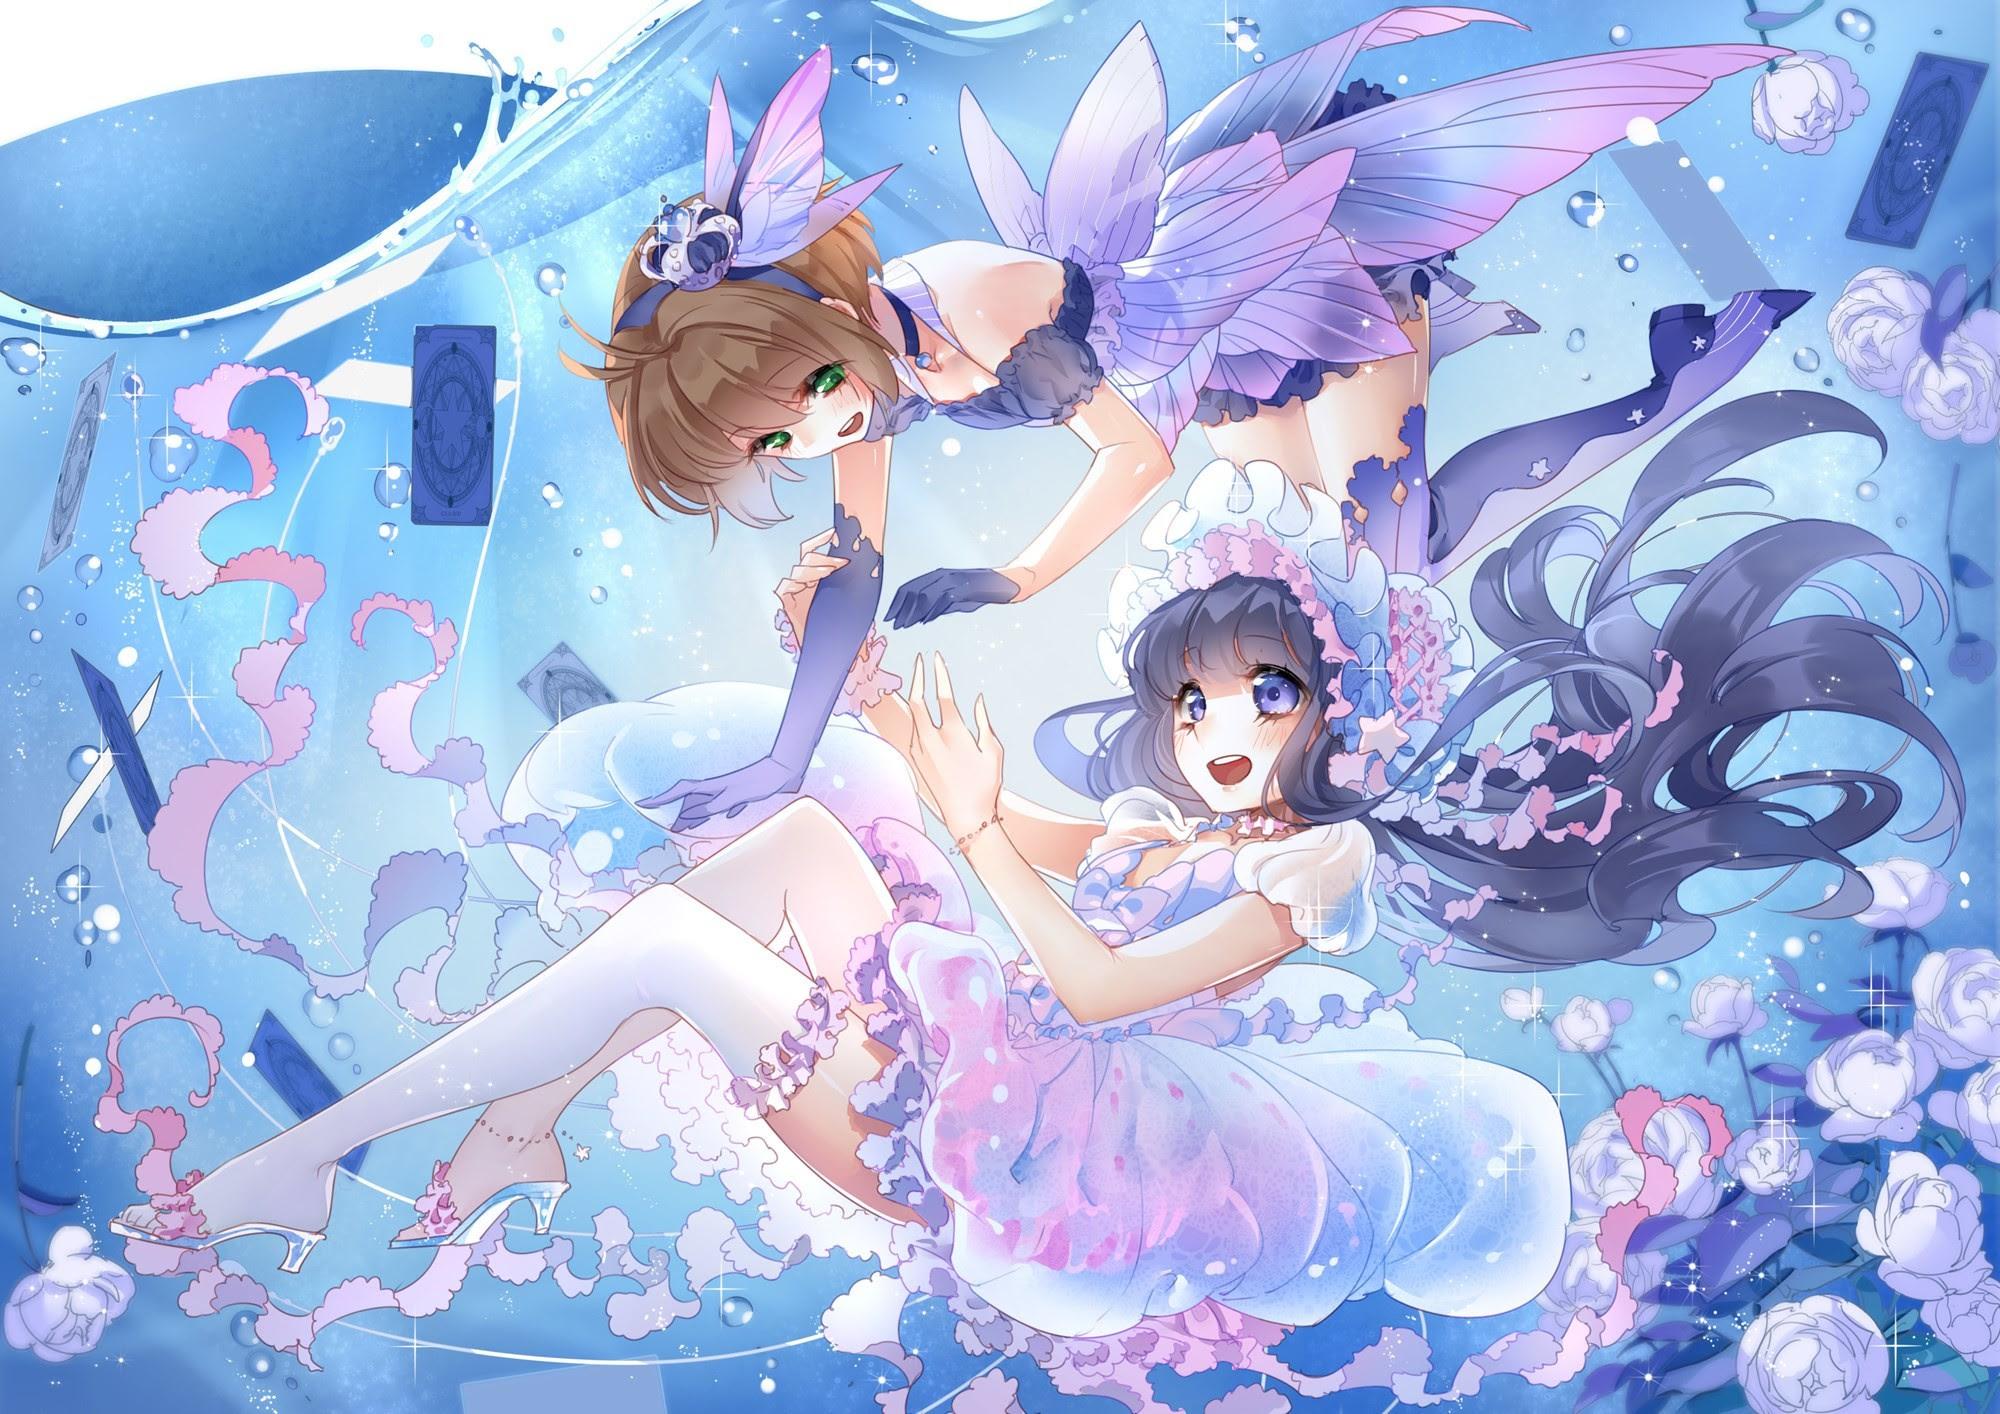 Cardcaptor Sakura Wallpaper 46 Images